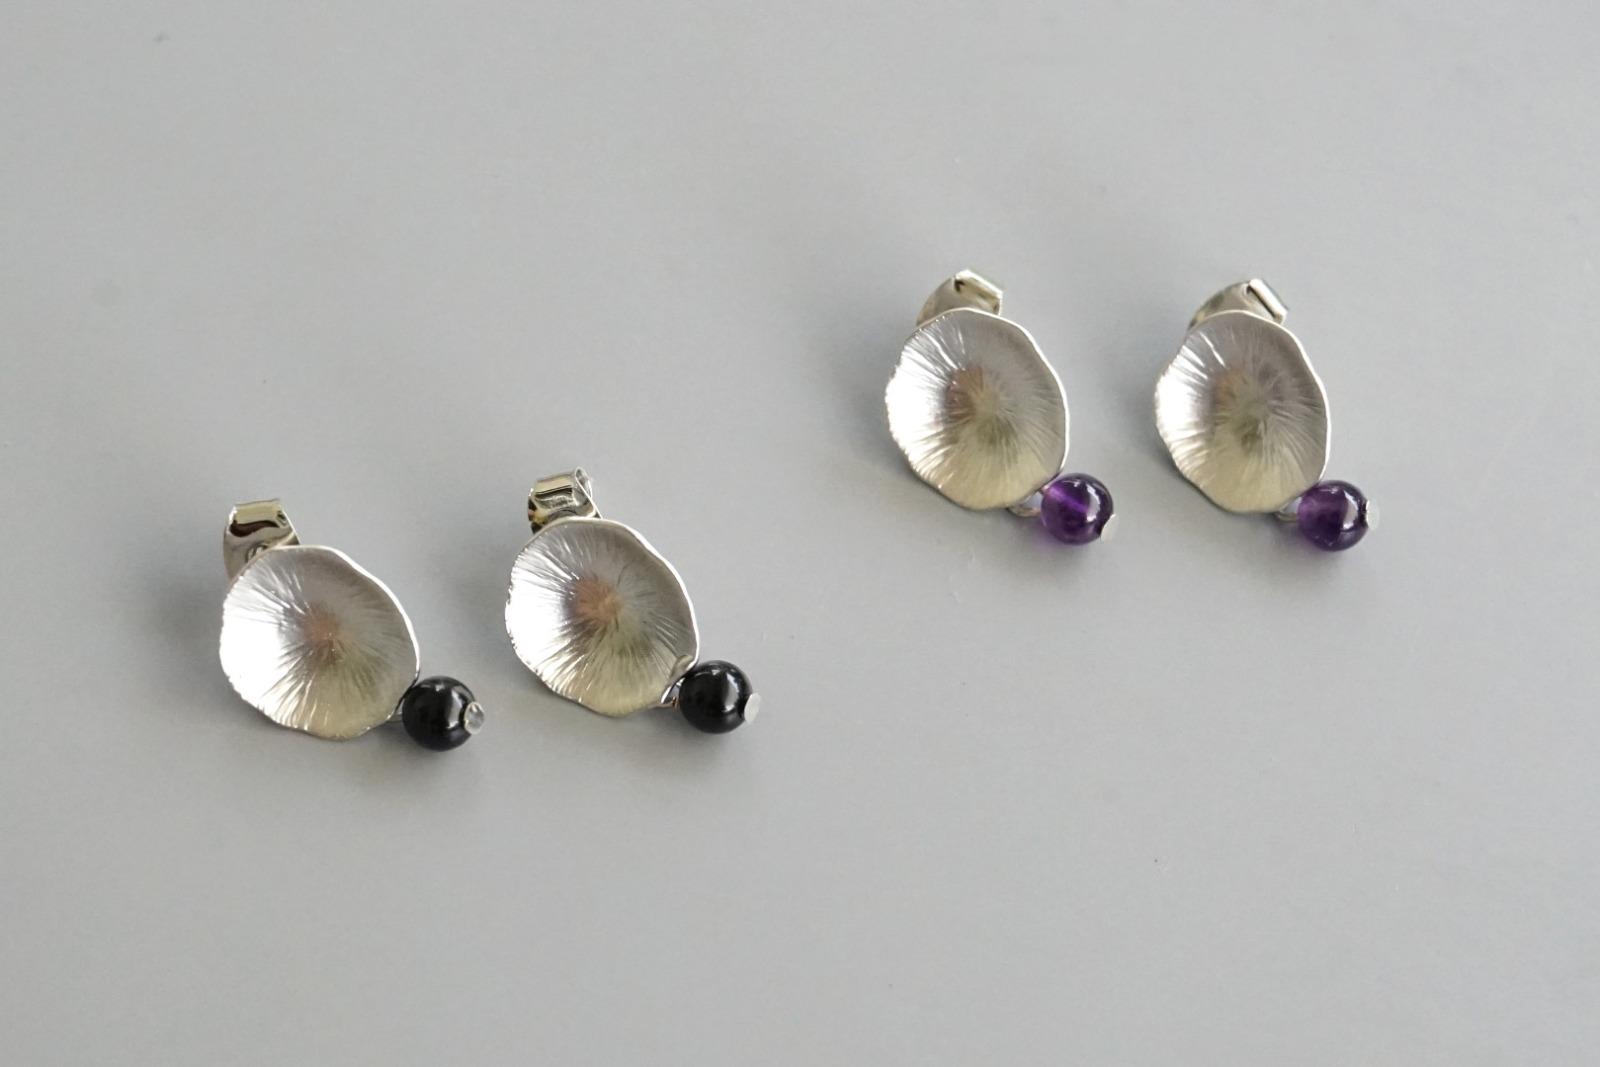 Ohrringe Ohrstecker Lotusblatt silber mit Perle Amethyst - 2